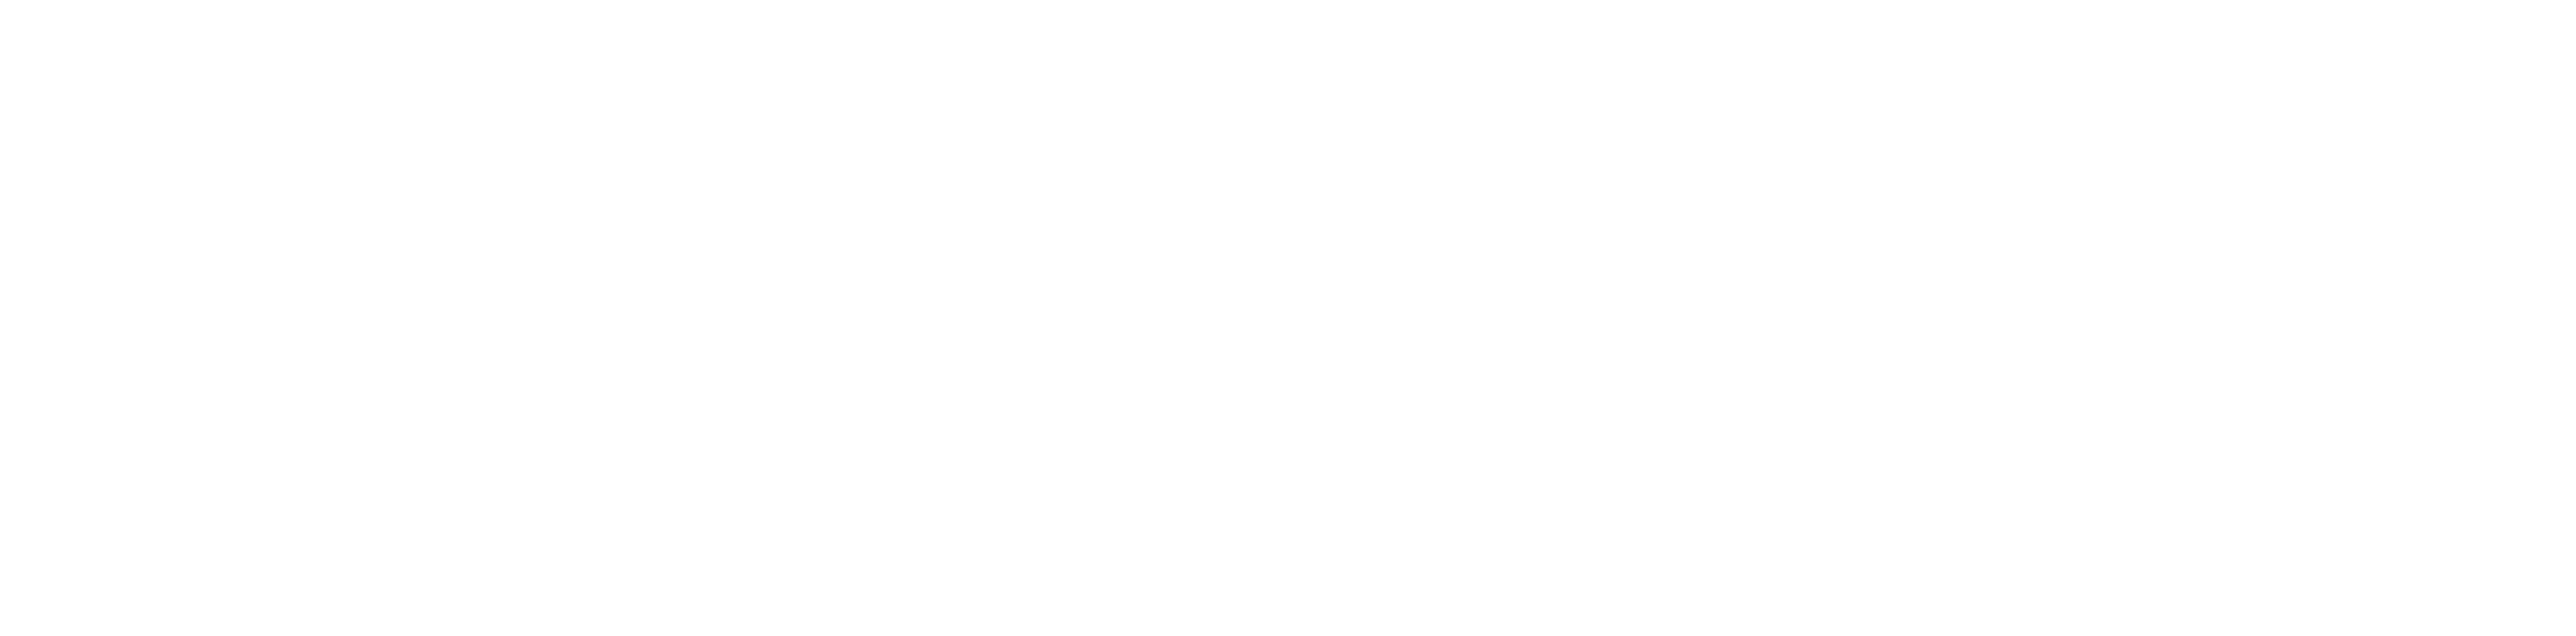 LH_Greatness Coaching Logo-04